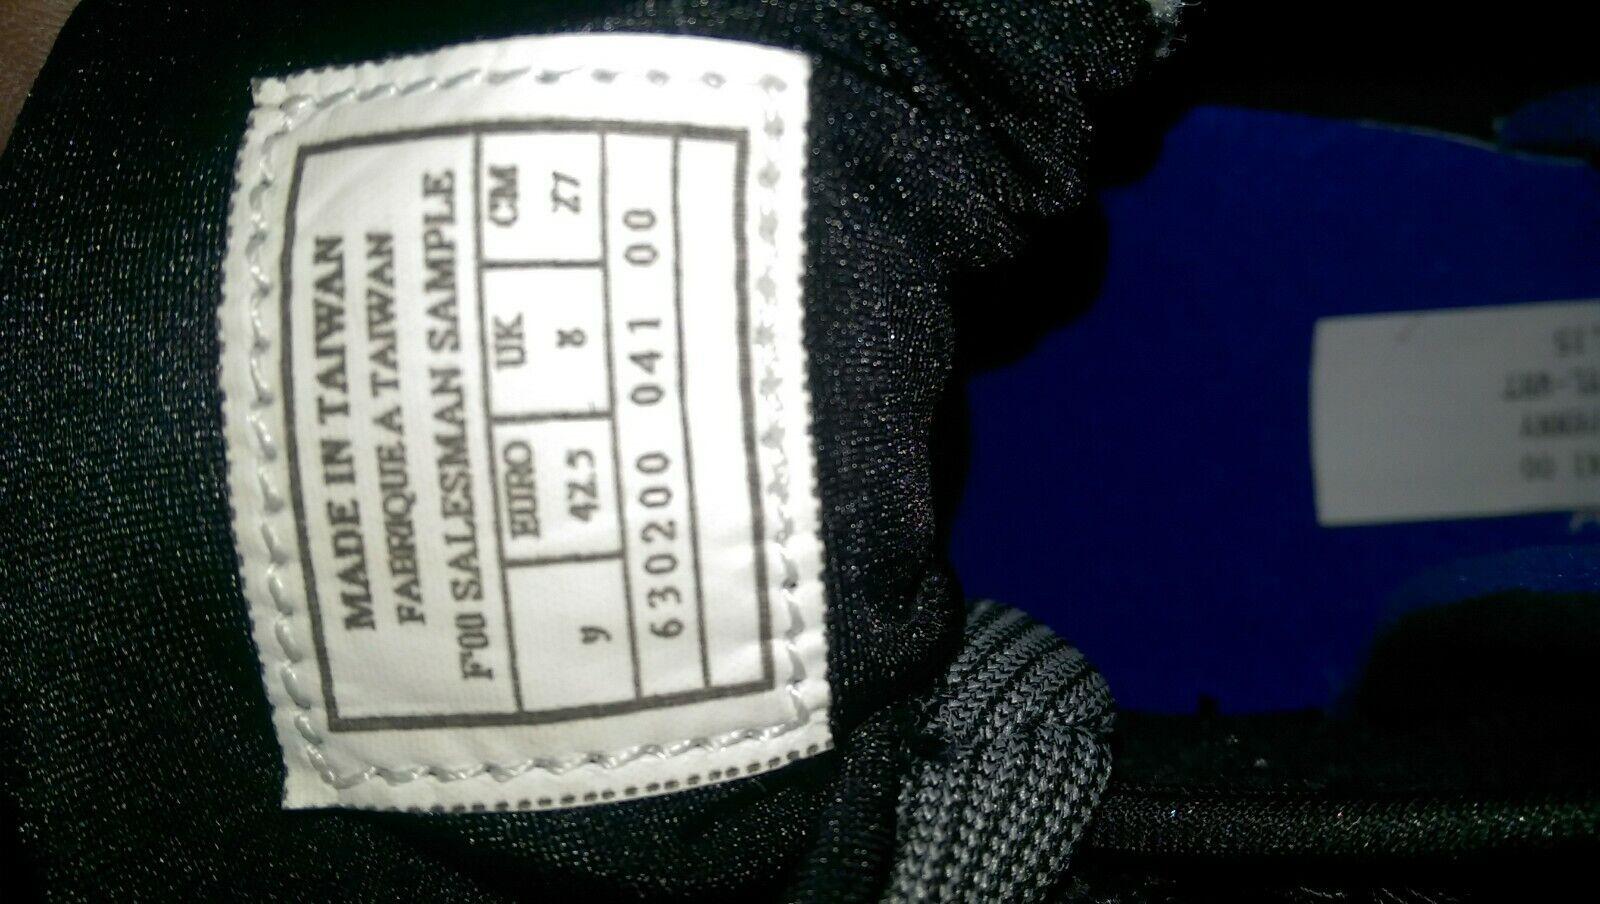 30ceb962483b0 Nike air max penny nike penny 1 nike sample sample jordan naofxl1967 ...